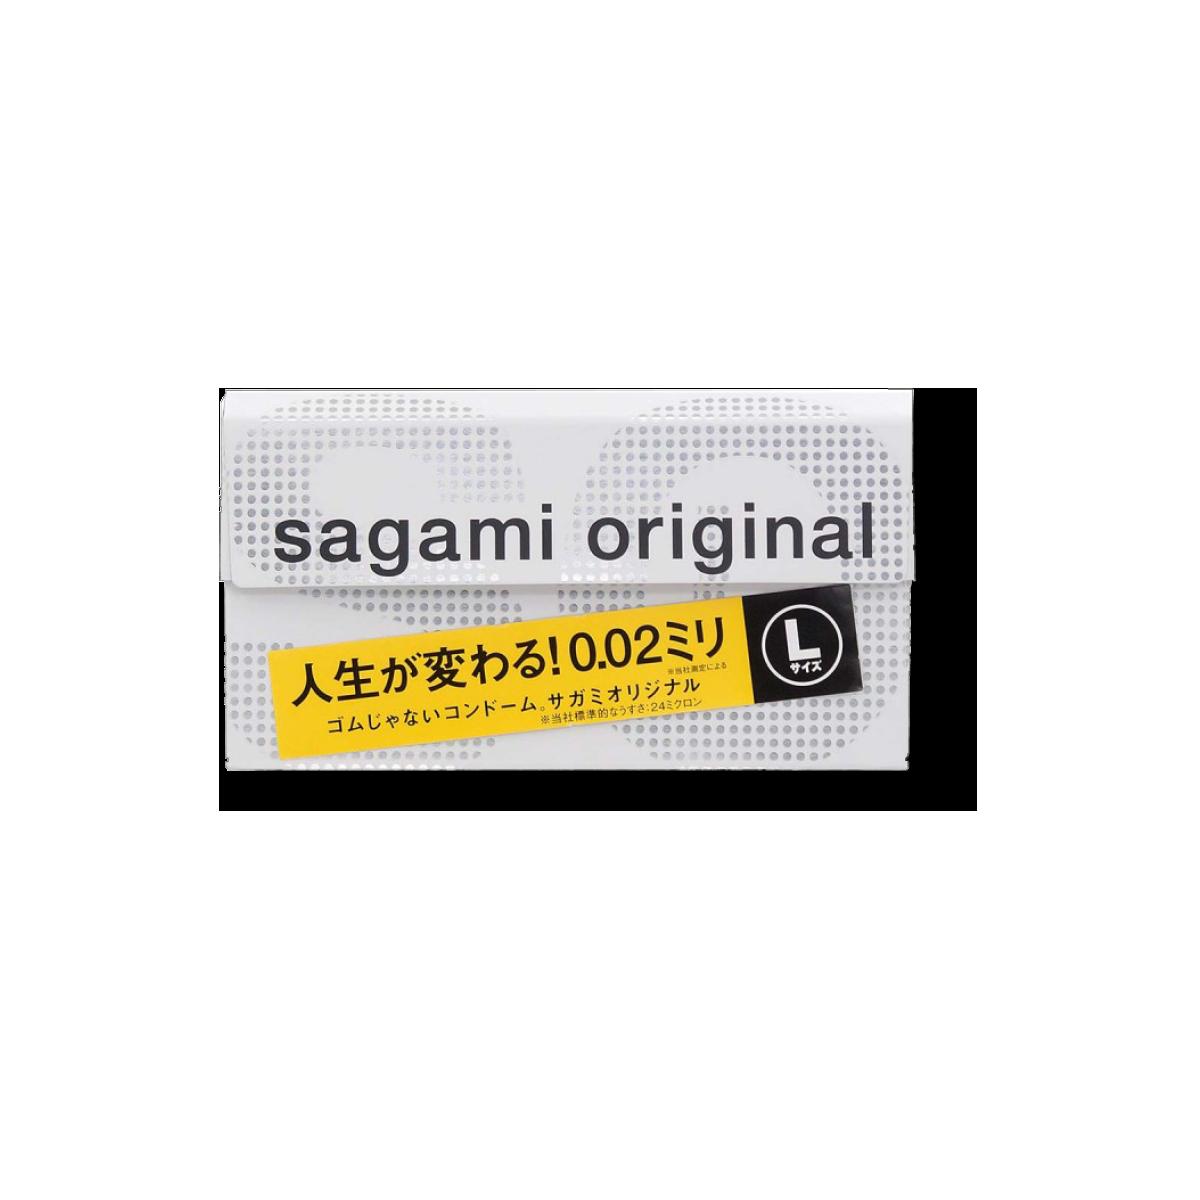 Sagami002加大碼套38mm